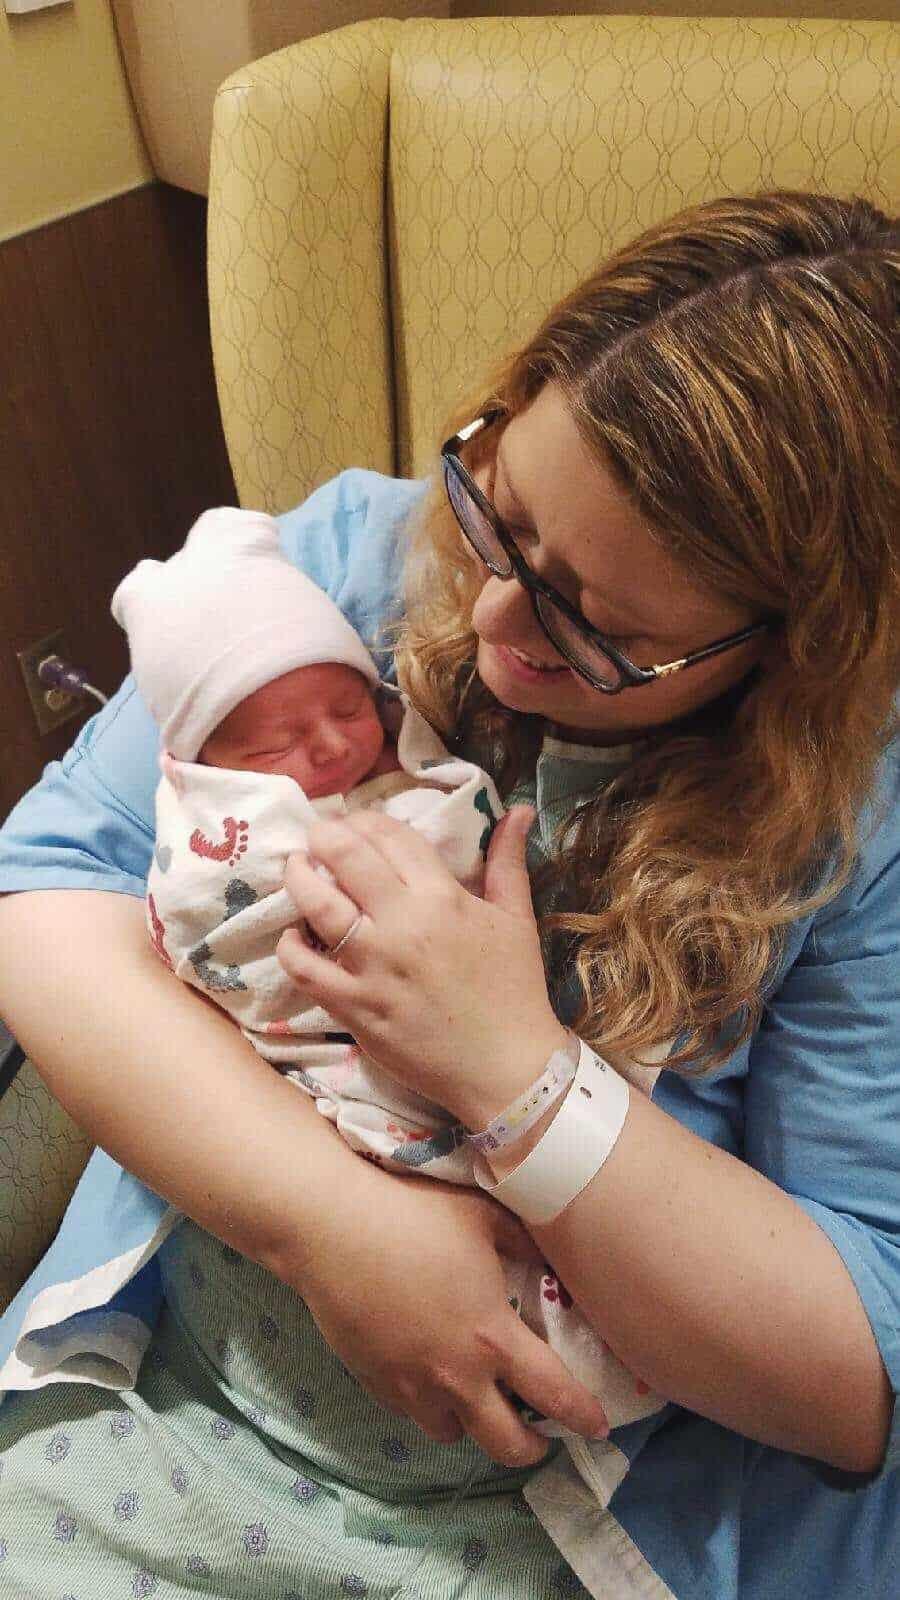 Baby Benedikt Kelnhofer on the day he was born